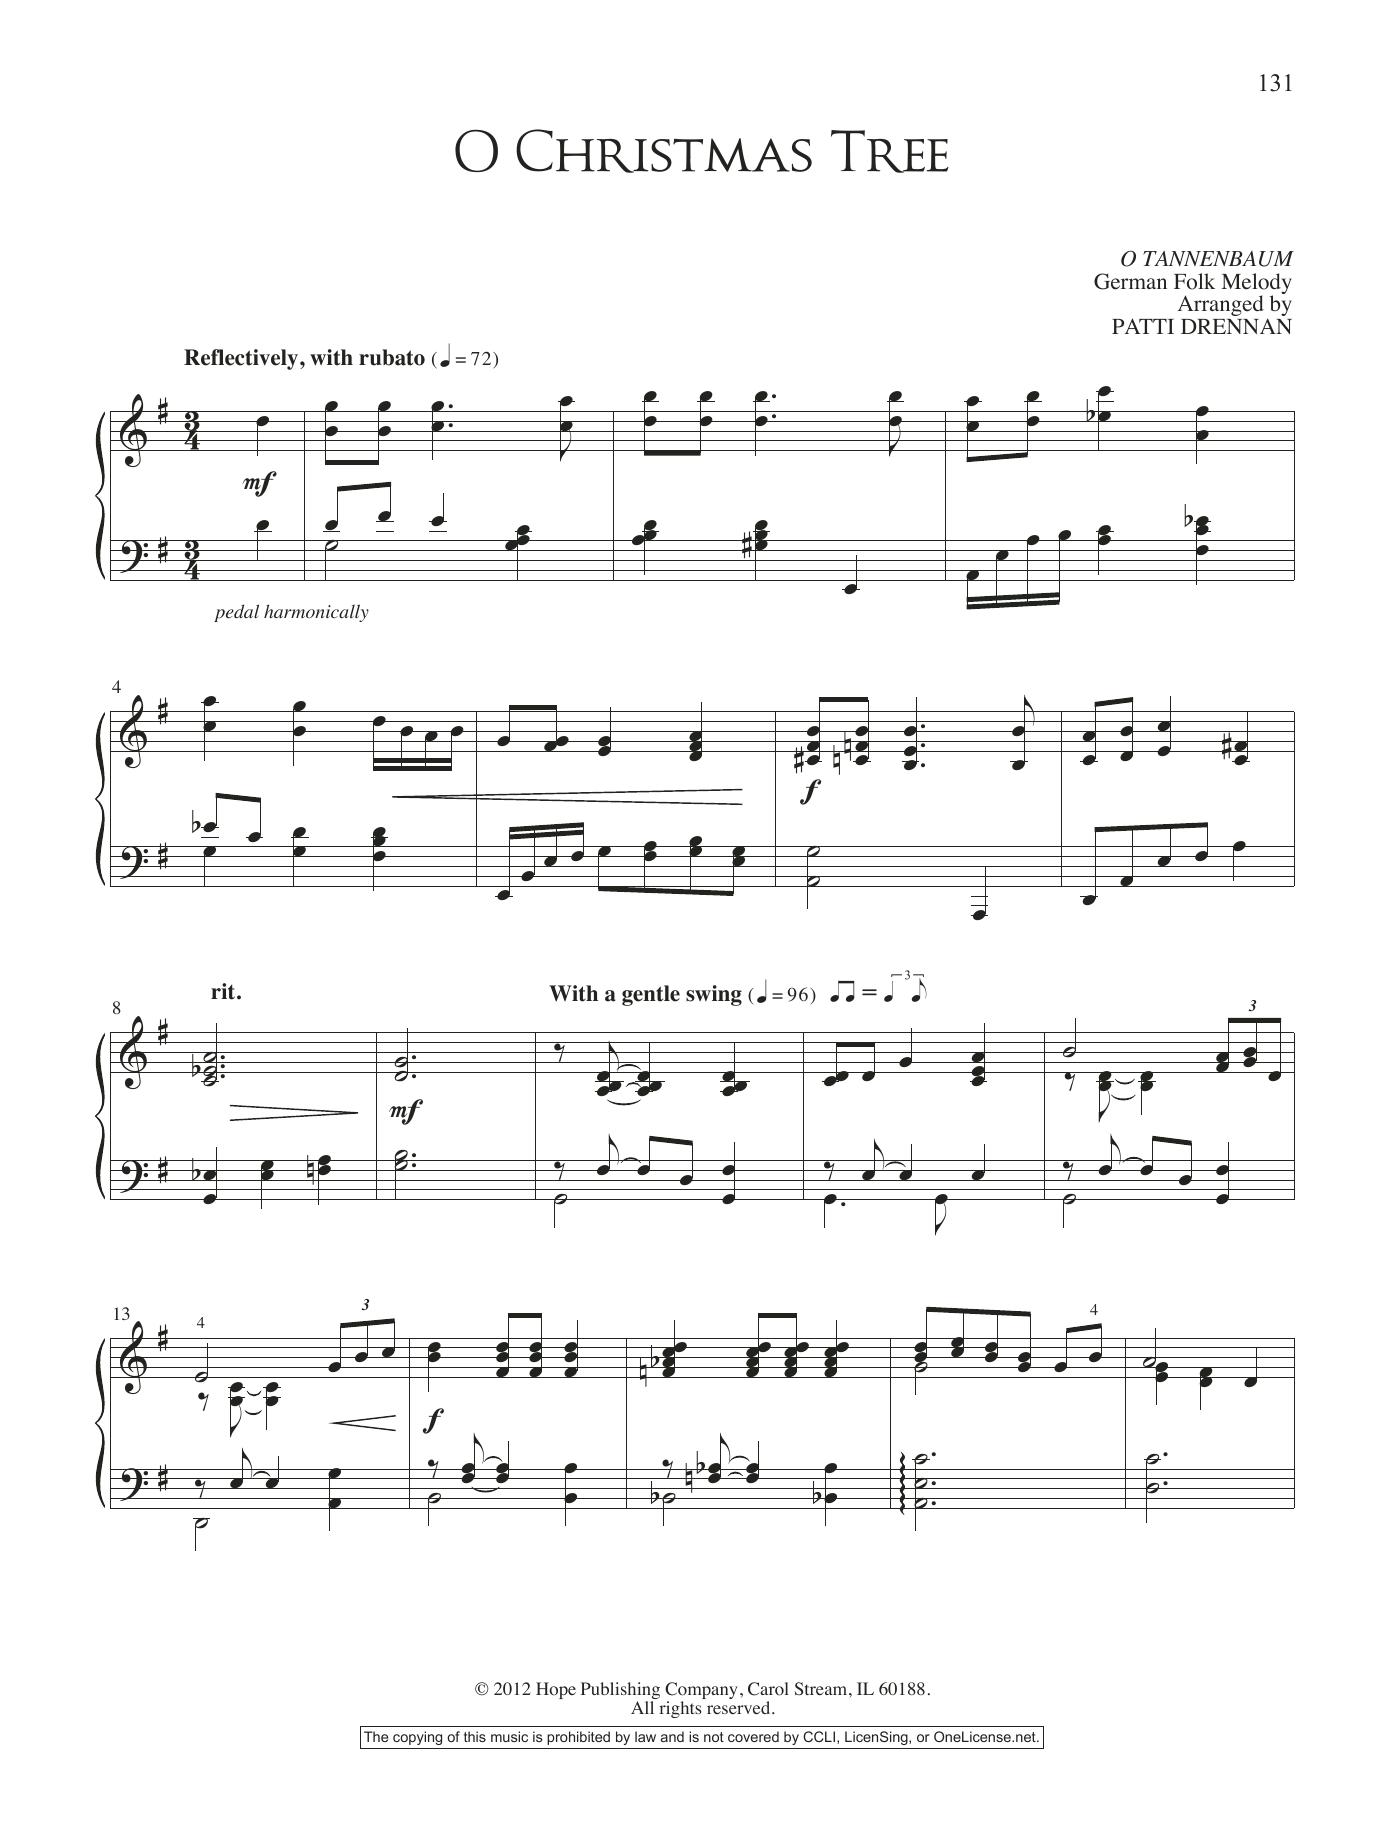 Patti Drennan O Christmas Tree sheet music notes and chords. Download Printable PDF.